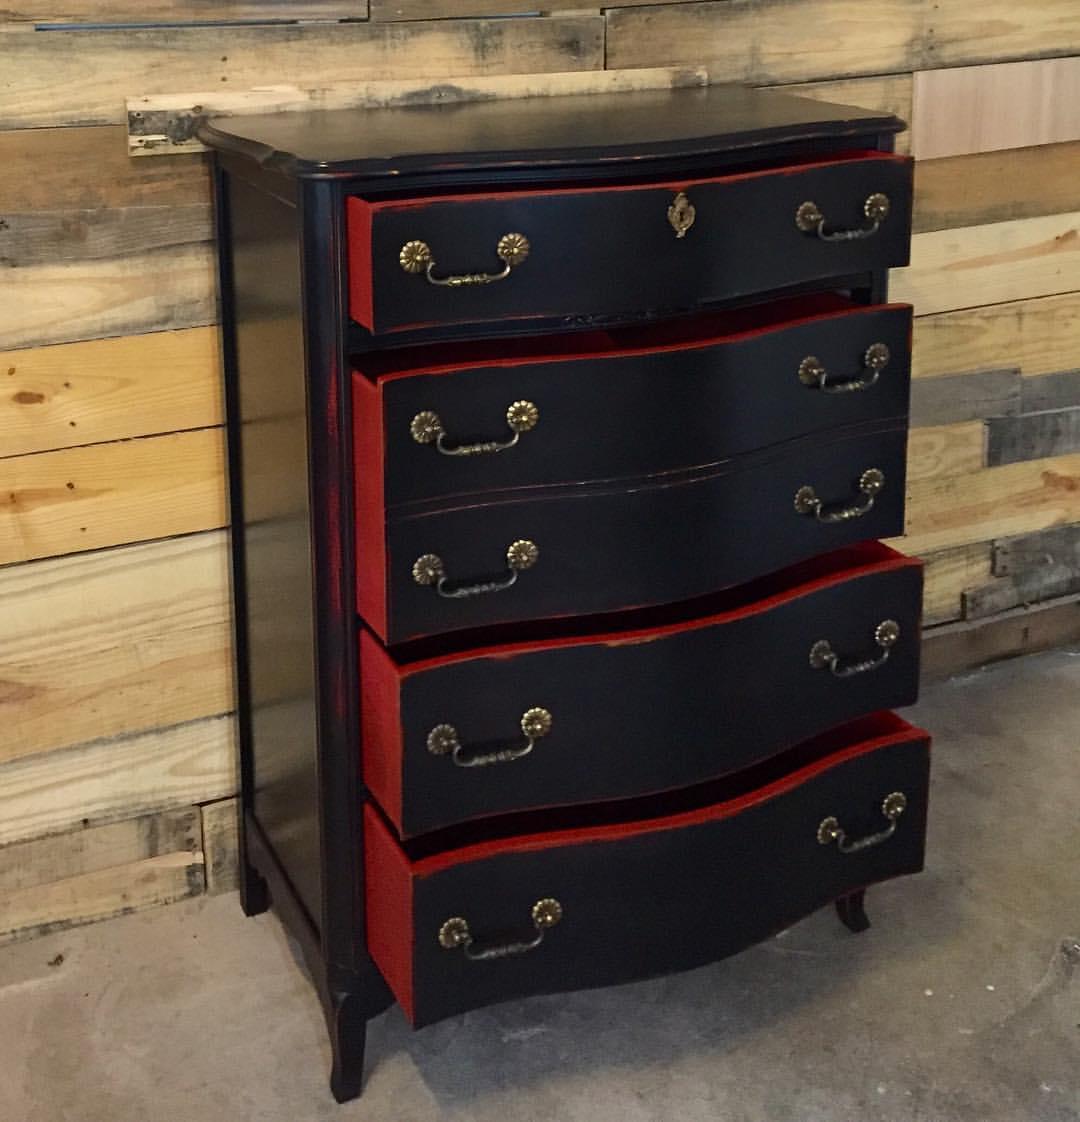 Red And Black Painted Dresser Euffslemani. Georgia Bulldog Dedicated Dresser  General Finishes Design Center